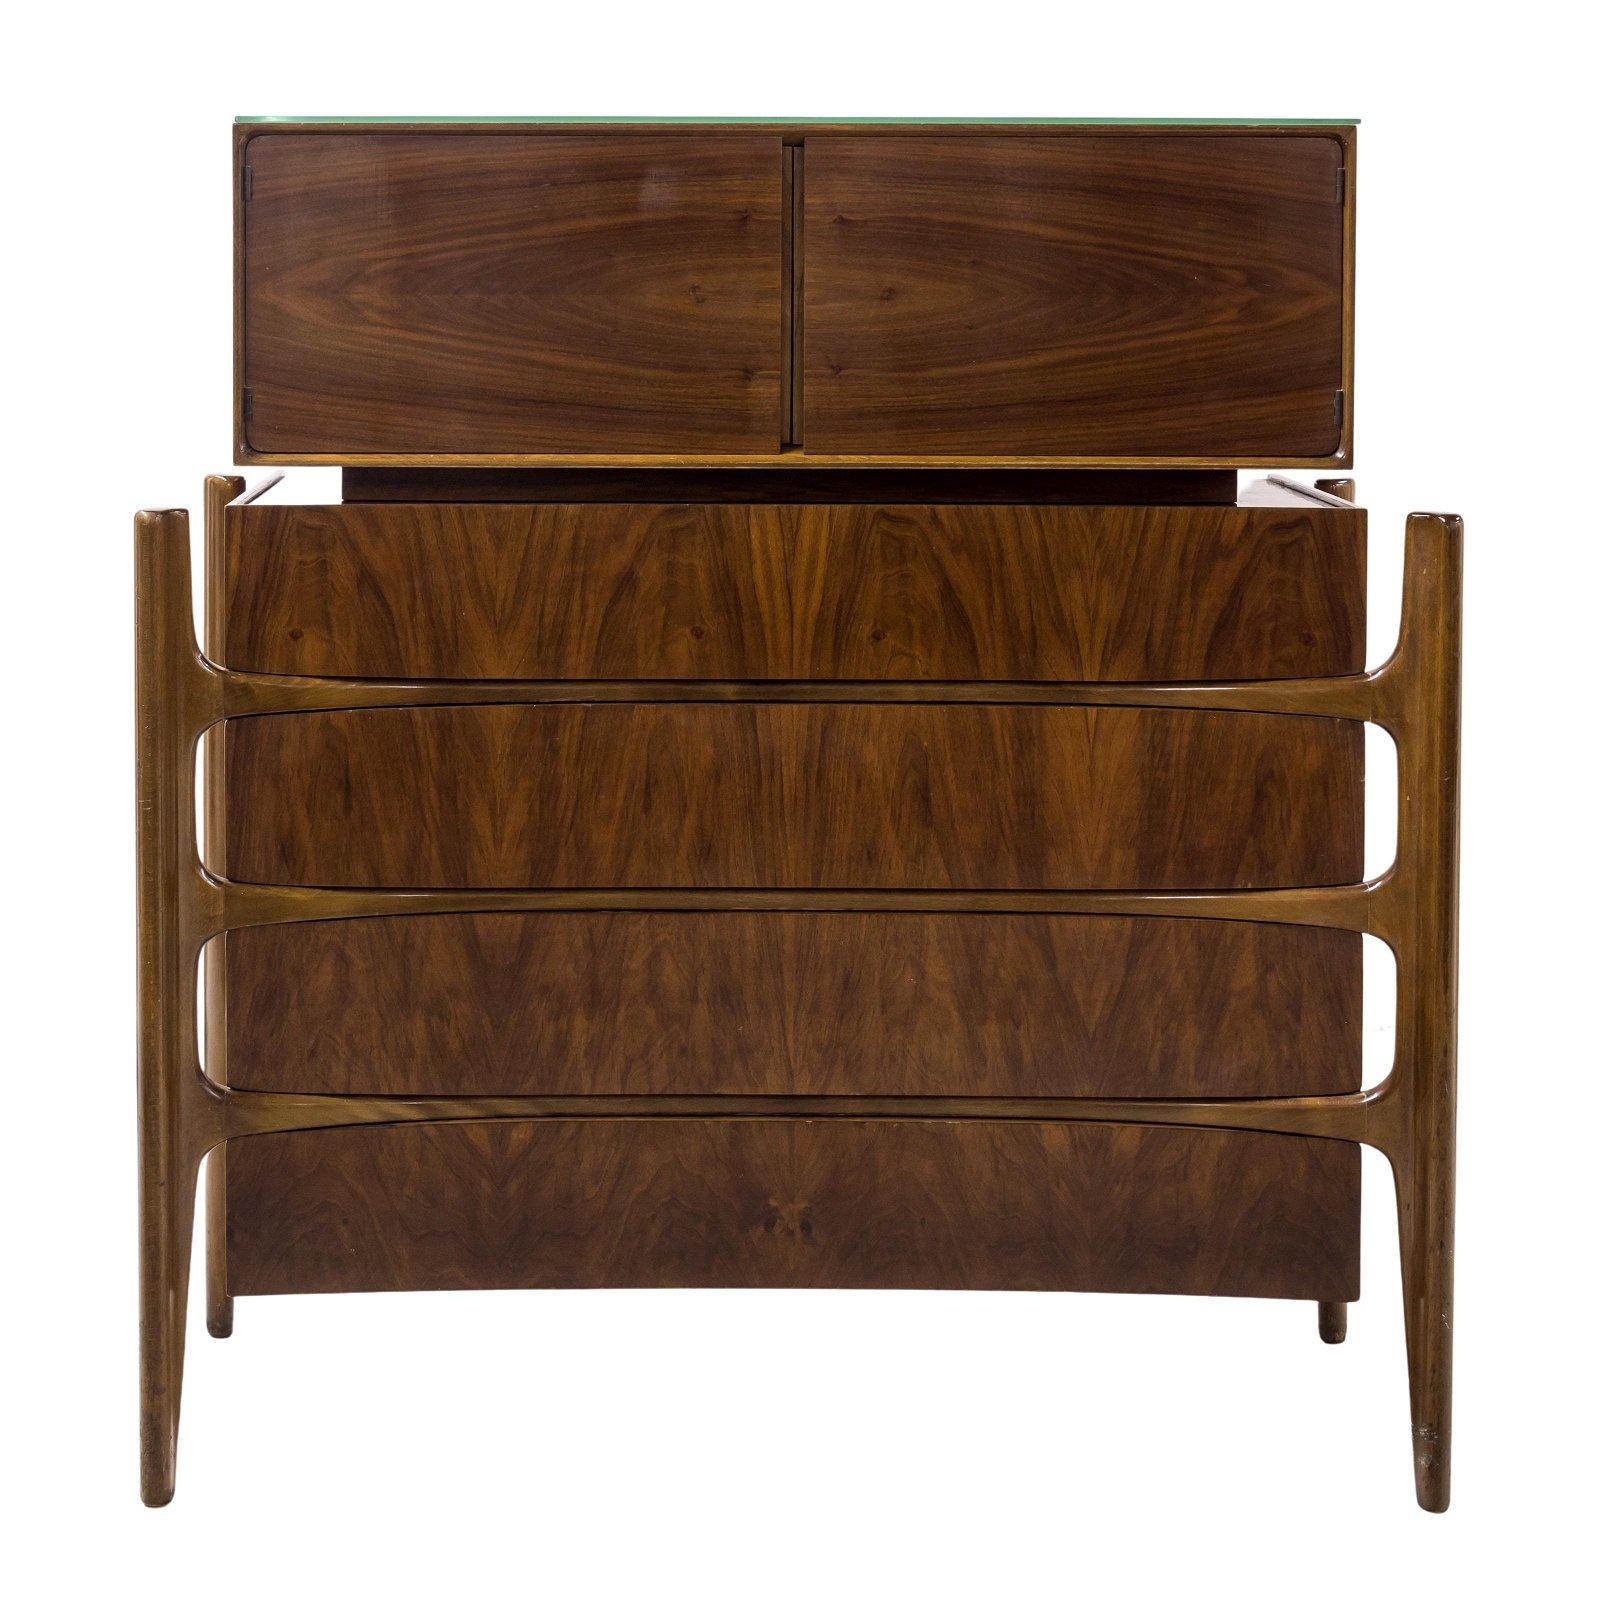 William Hinn Mid Century Modern MCM Walnut Dresser